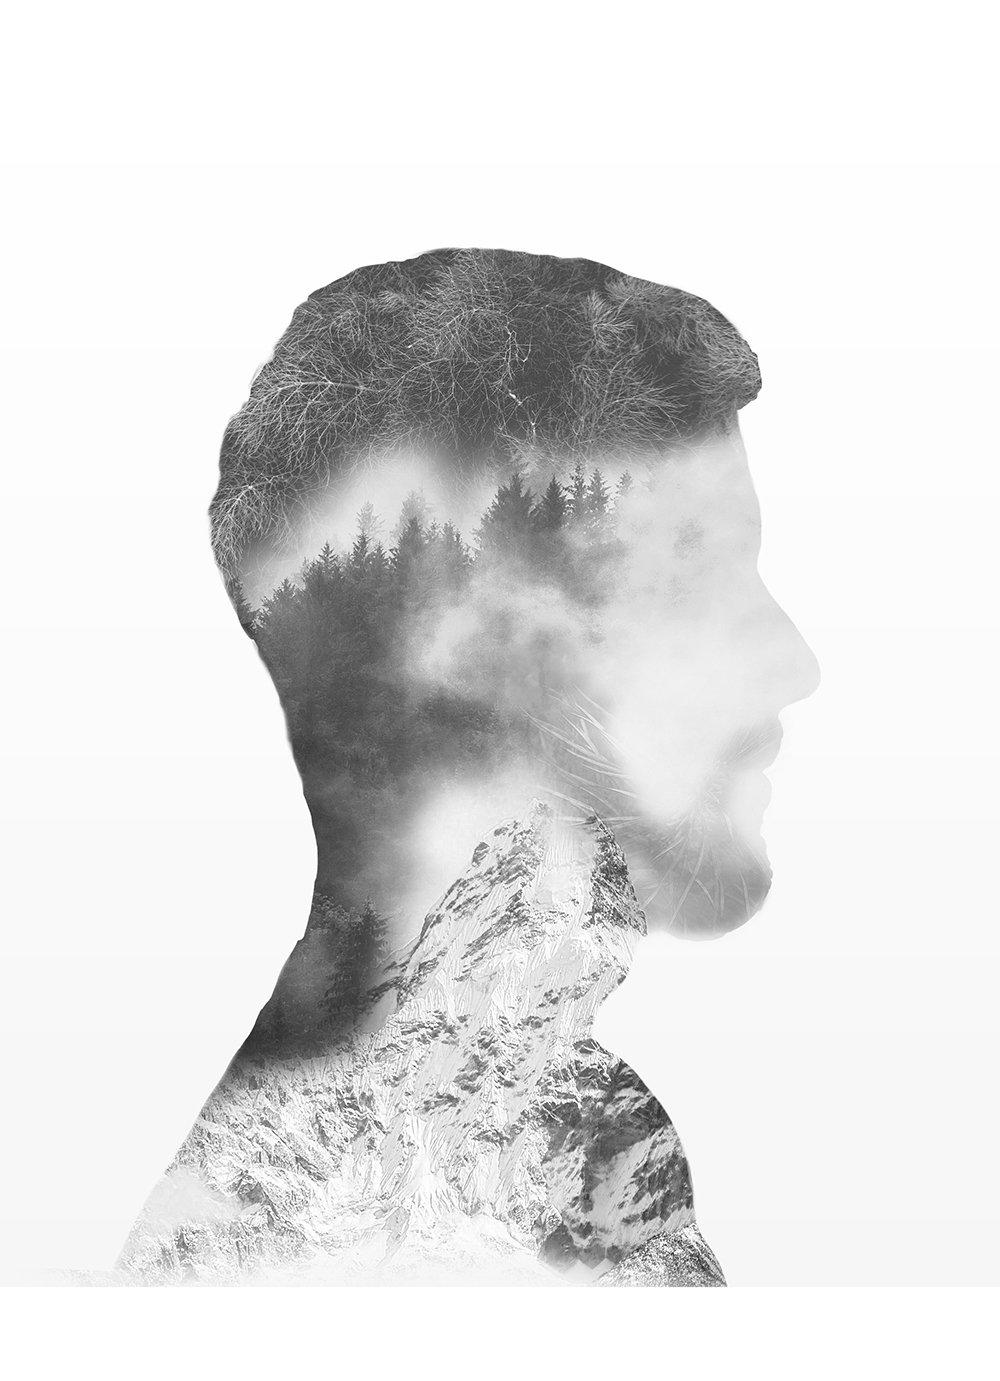 Matteo Colombo Graphic Designer